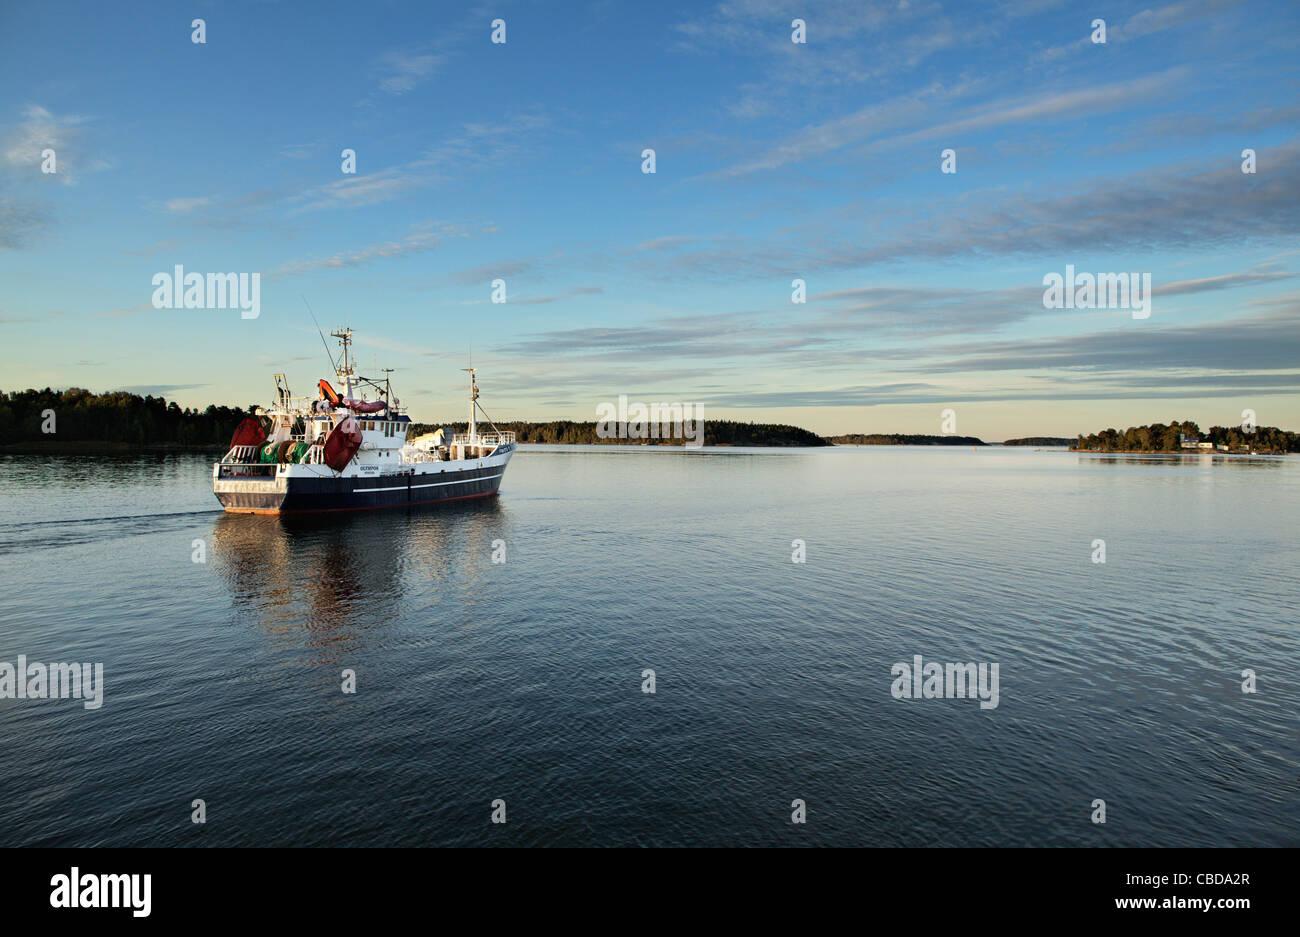 how to catch lake herring